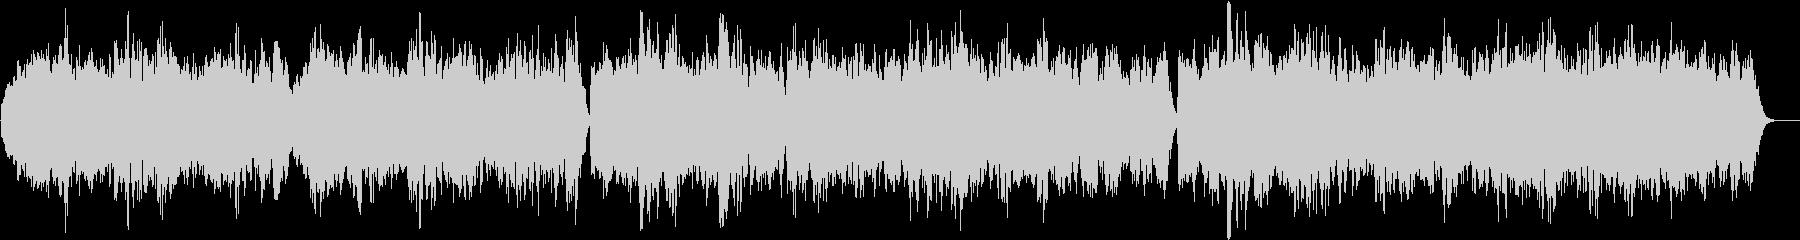 G線上のアリア〜弦楽合奏バージョン〜の未再生の波形